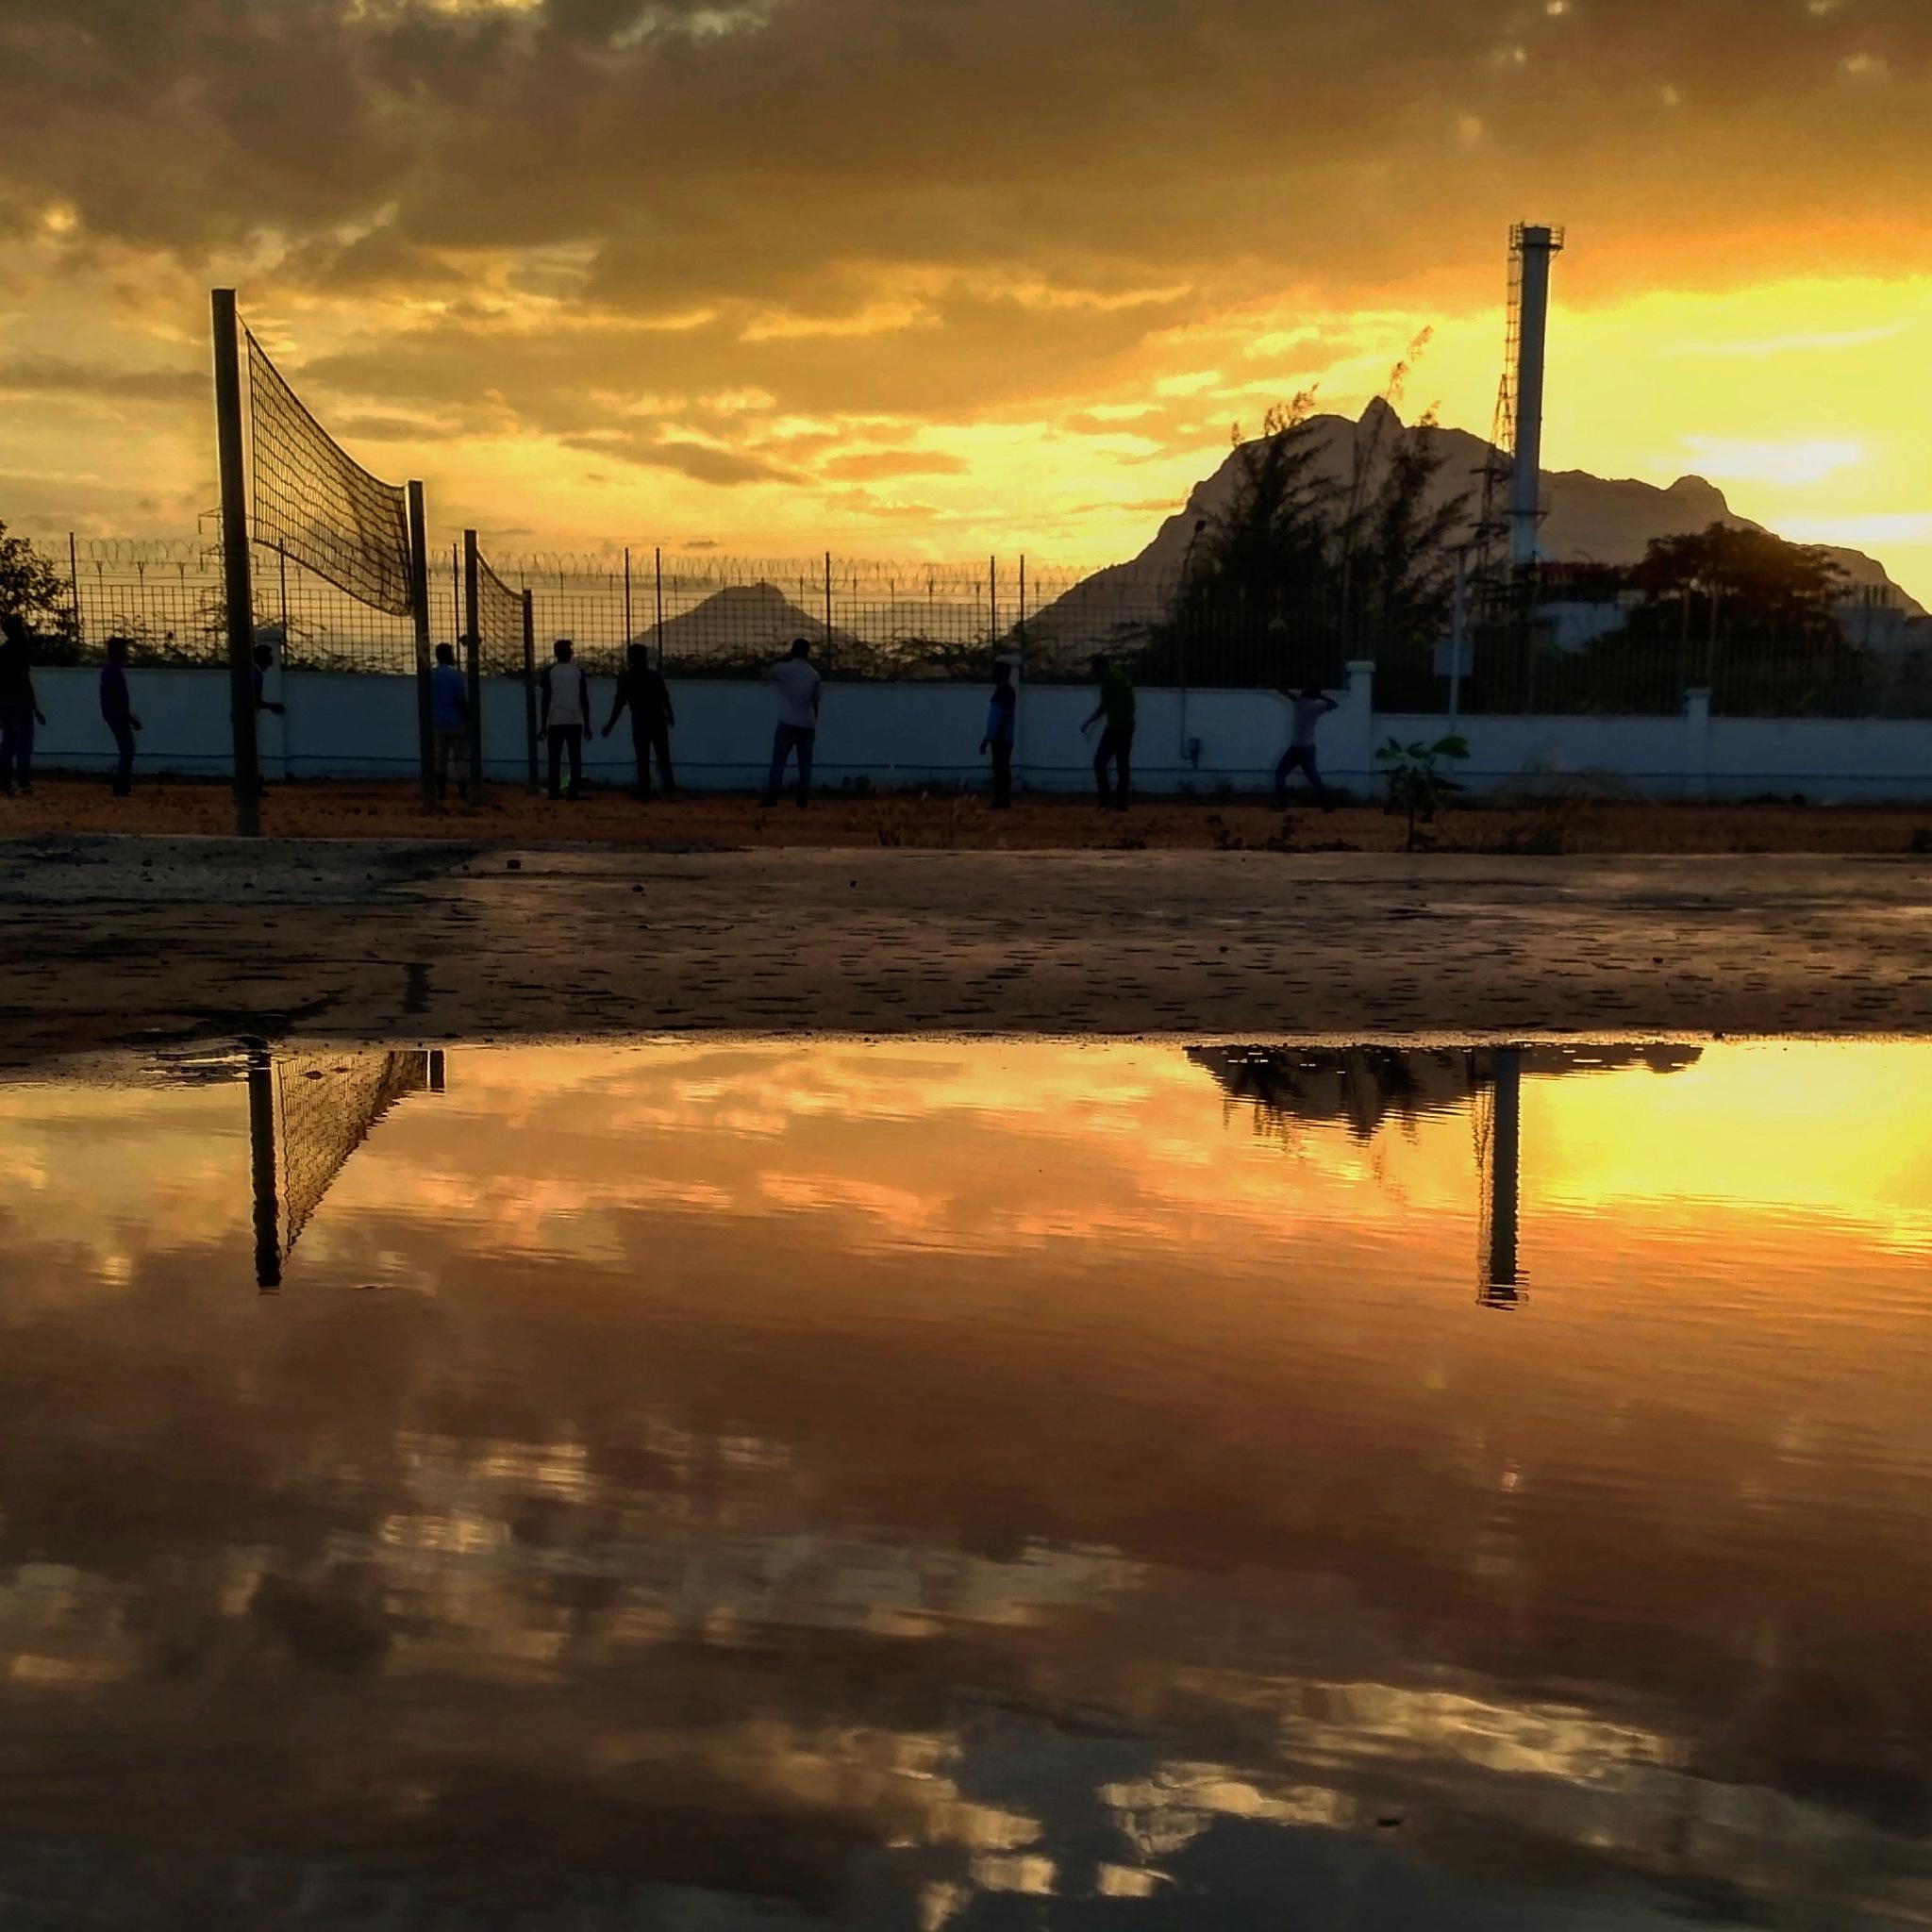 evng shot  by M0bile clicks